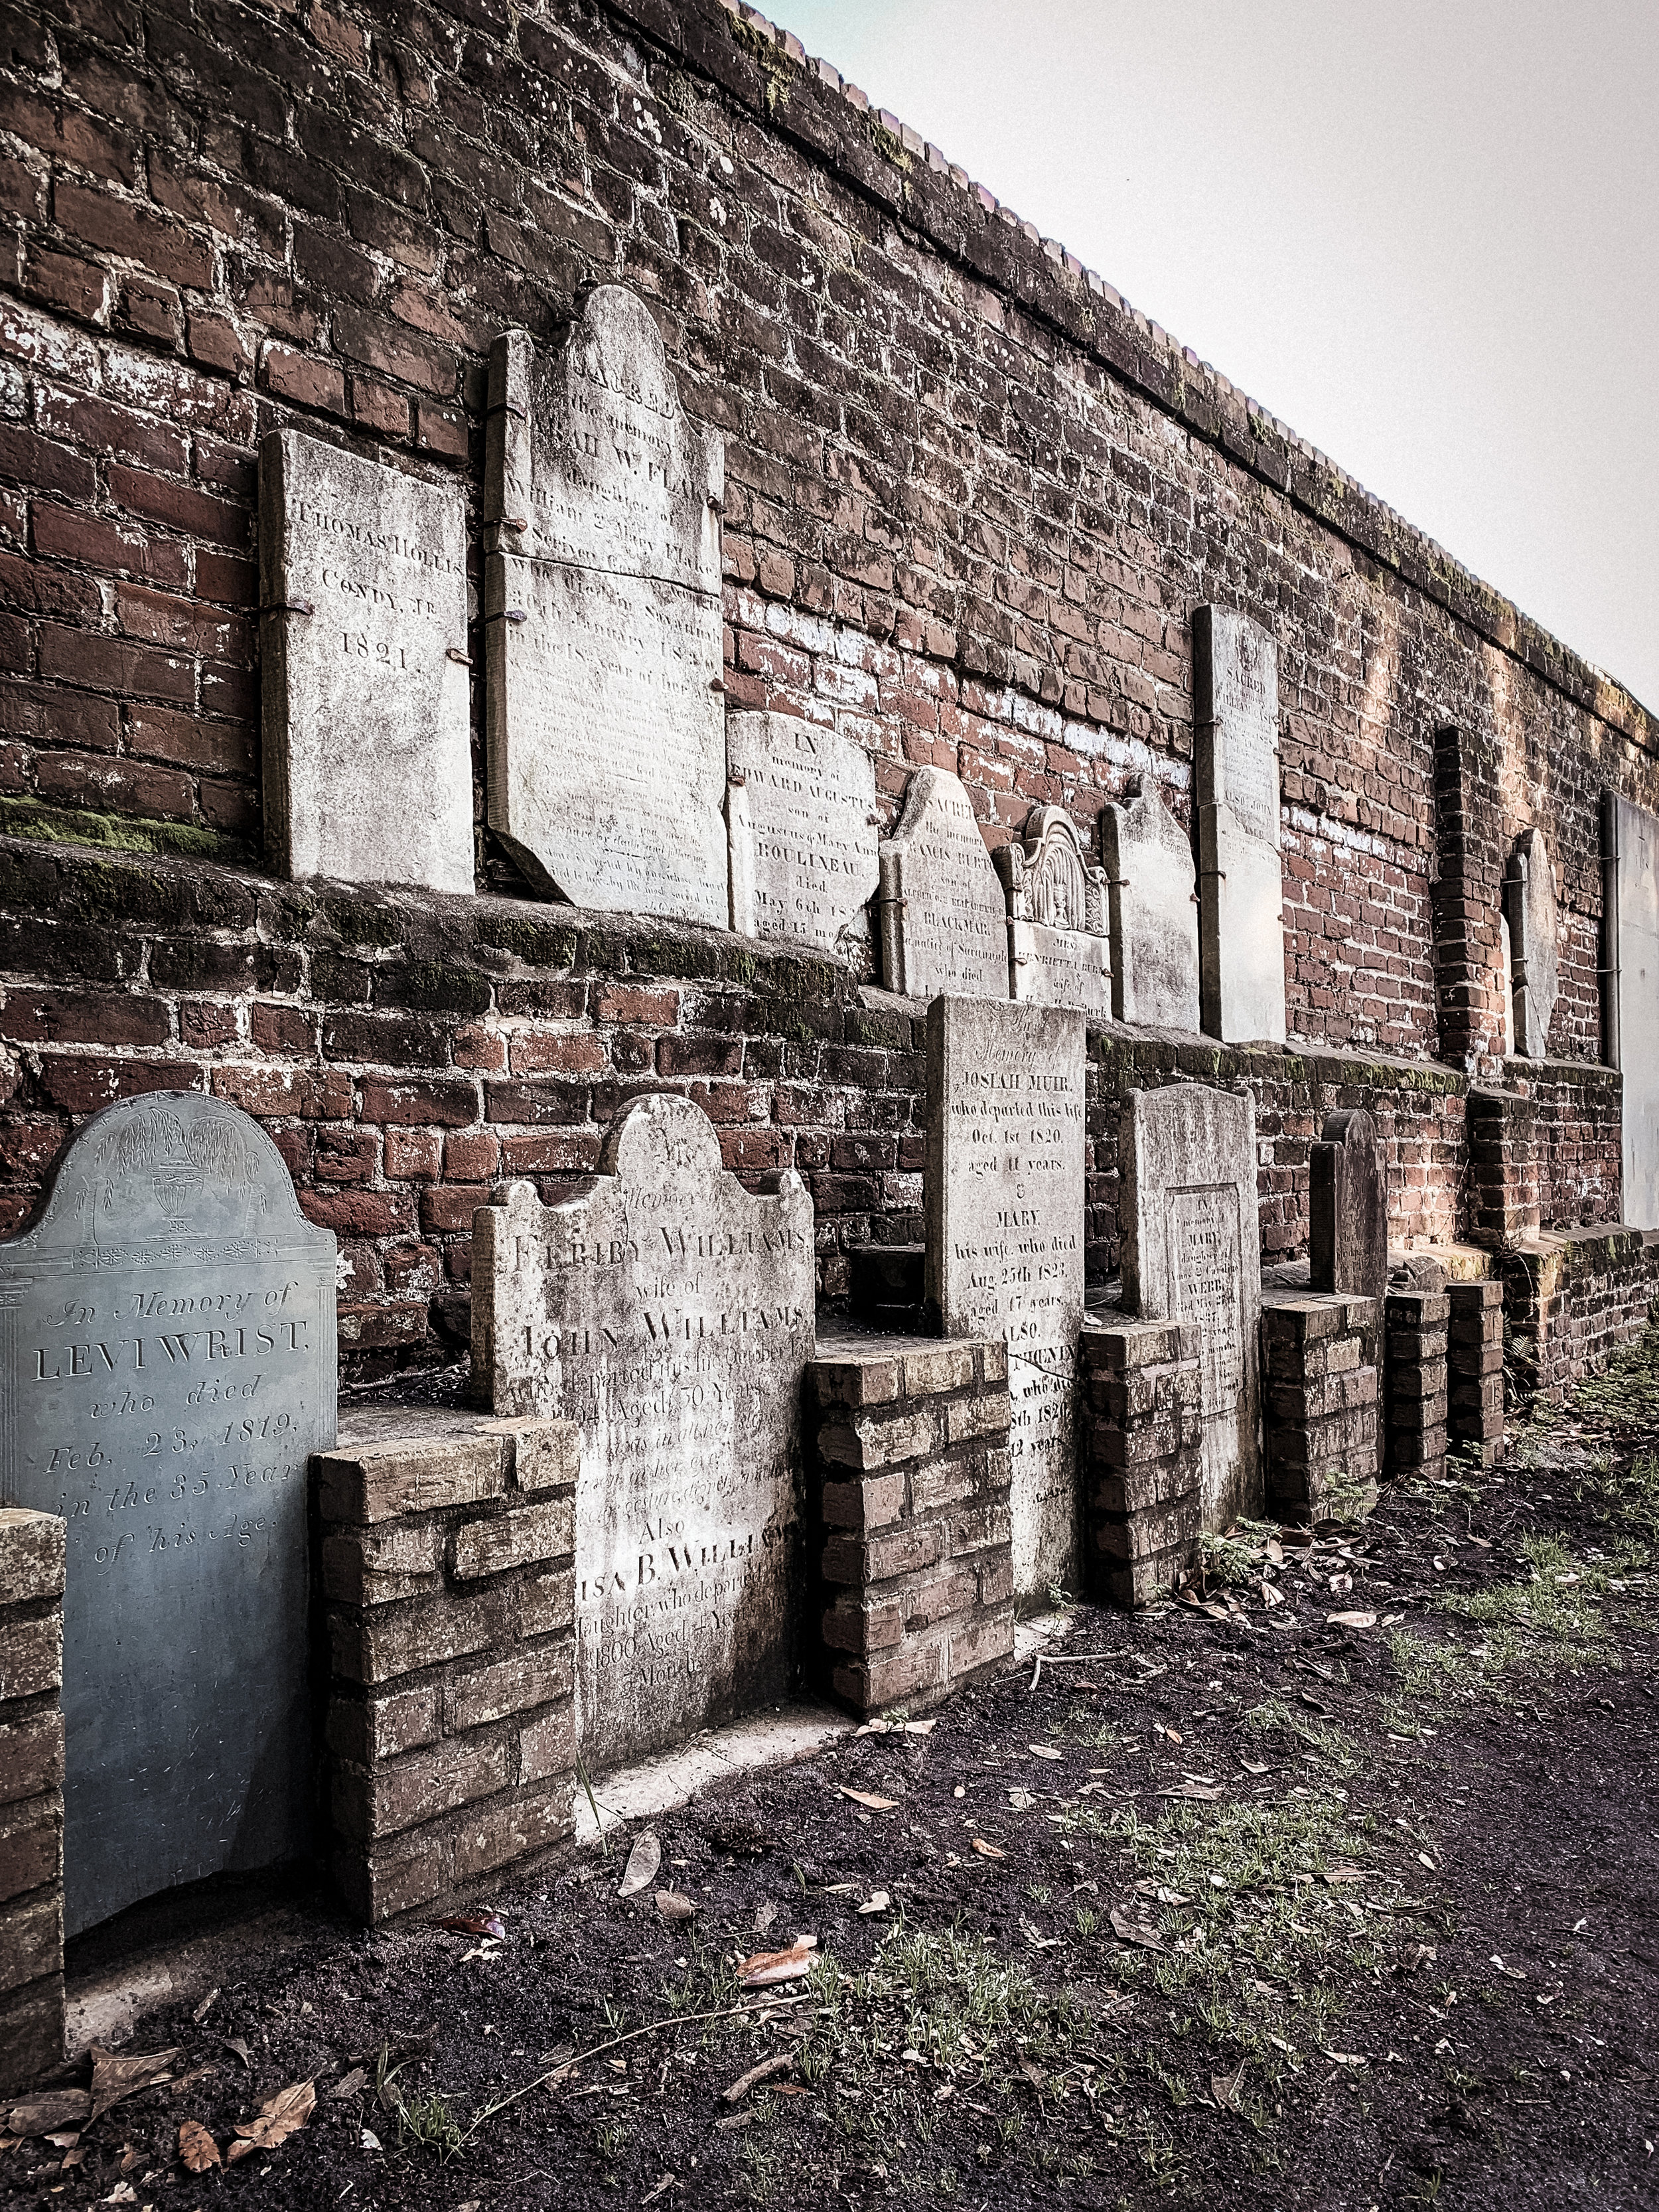 LSS Savannah Cemetery